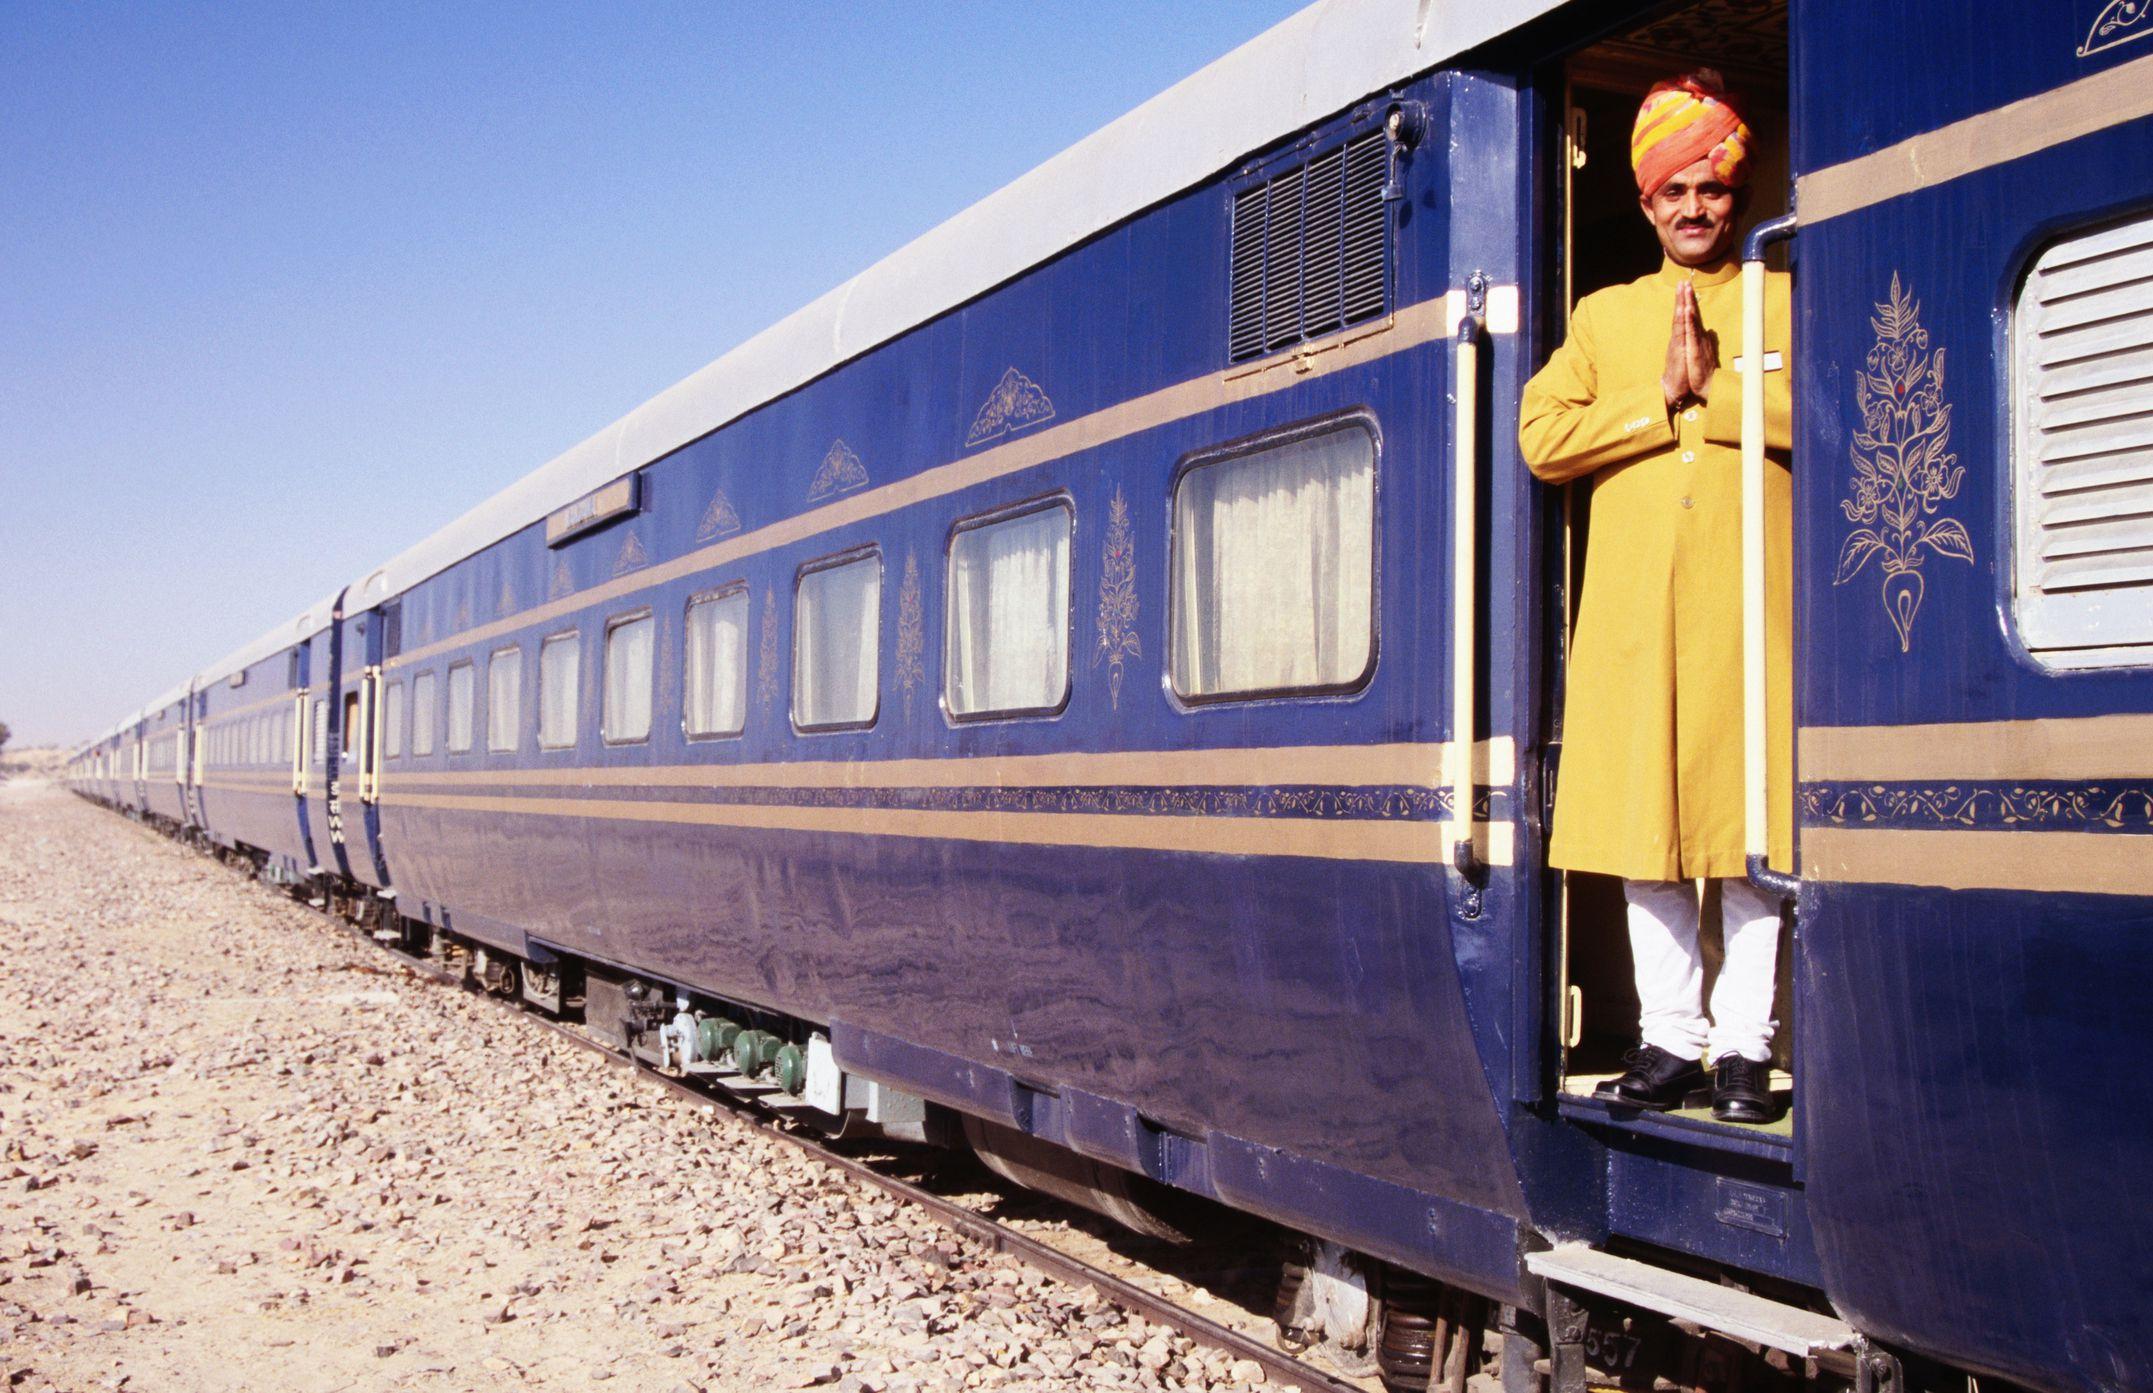 United States on a Luxury Train Tour